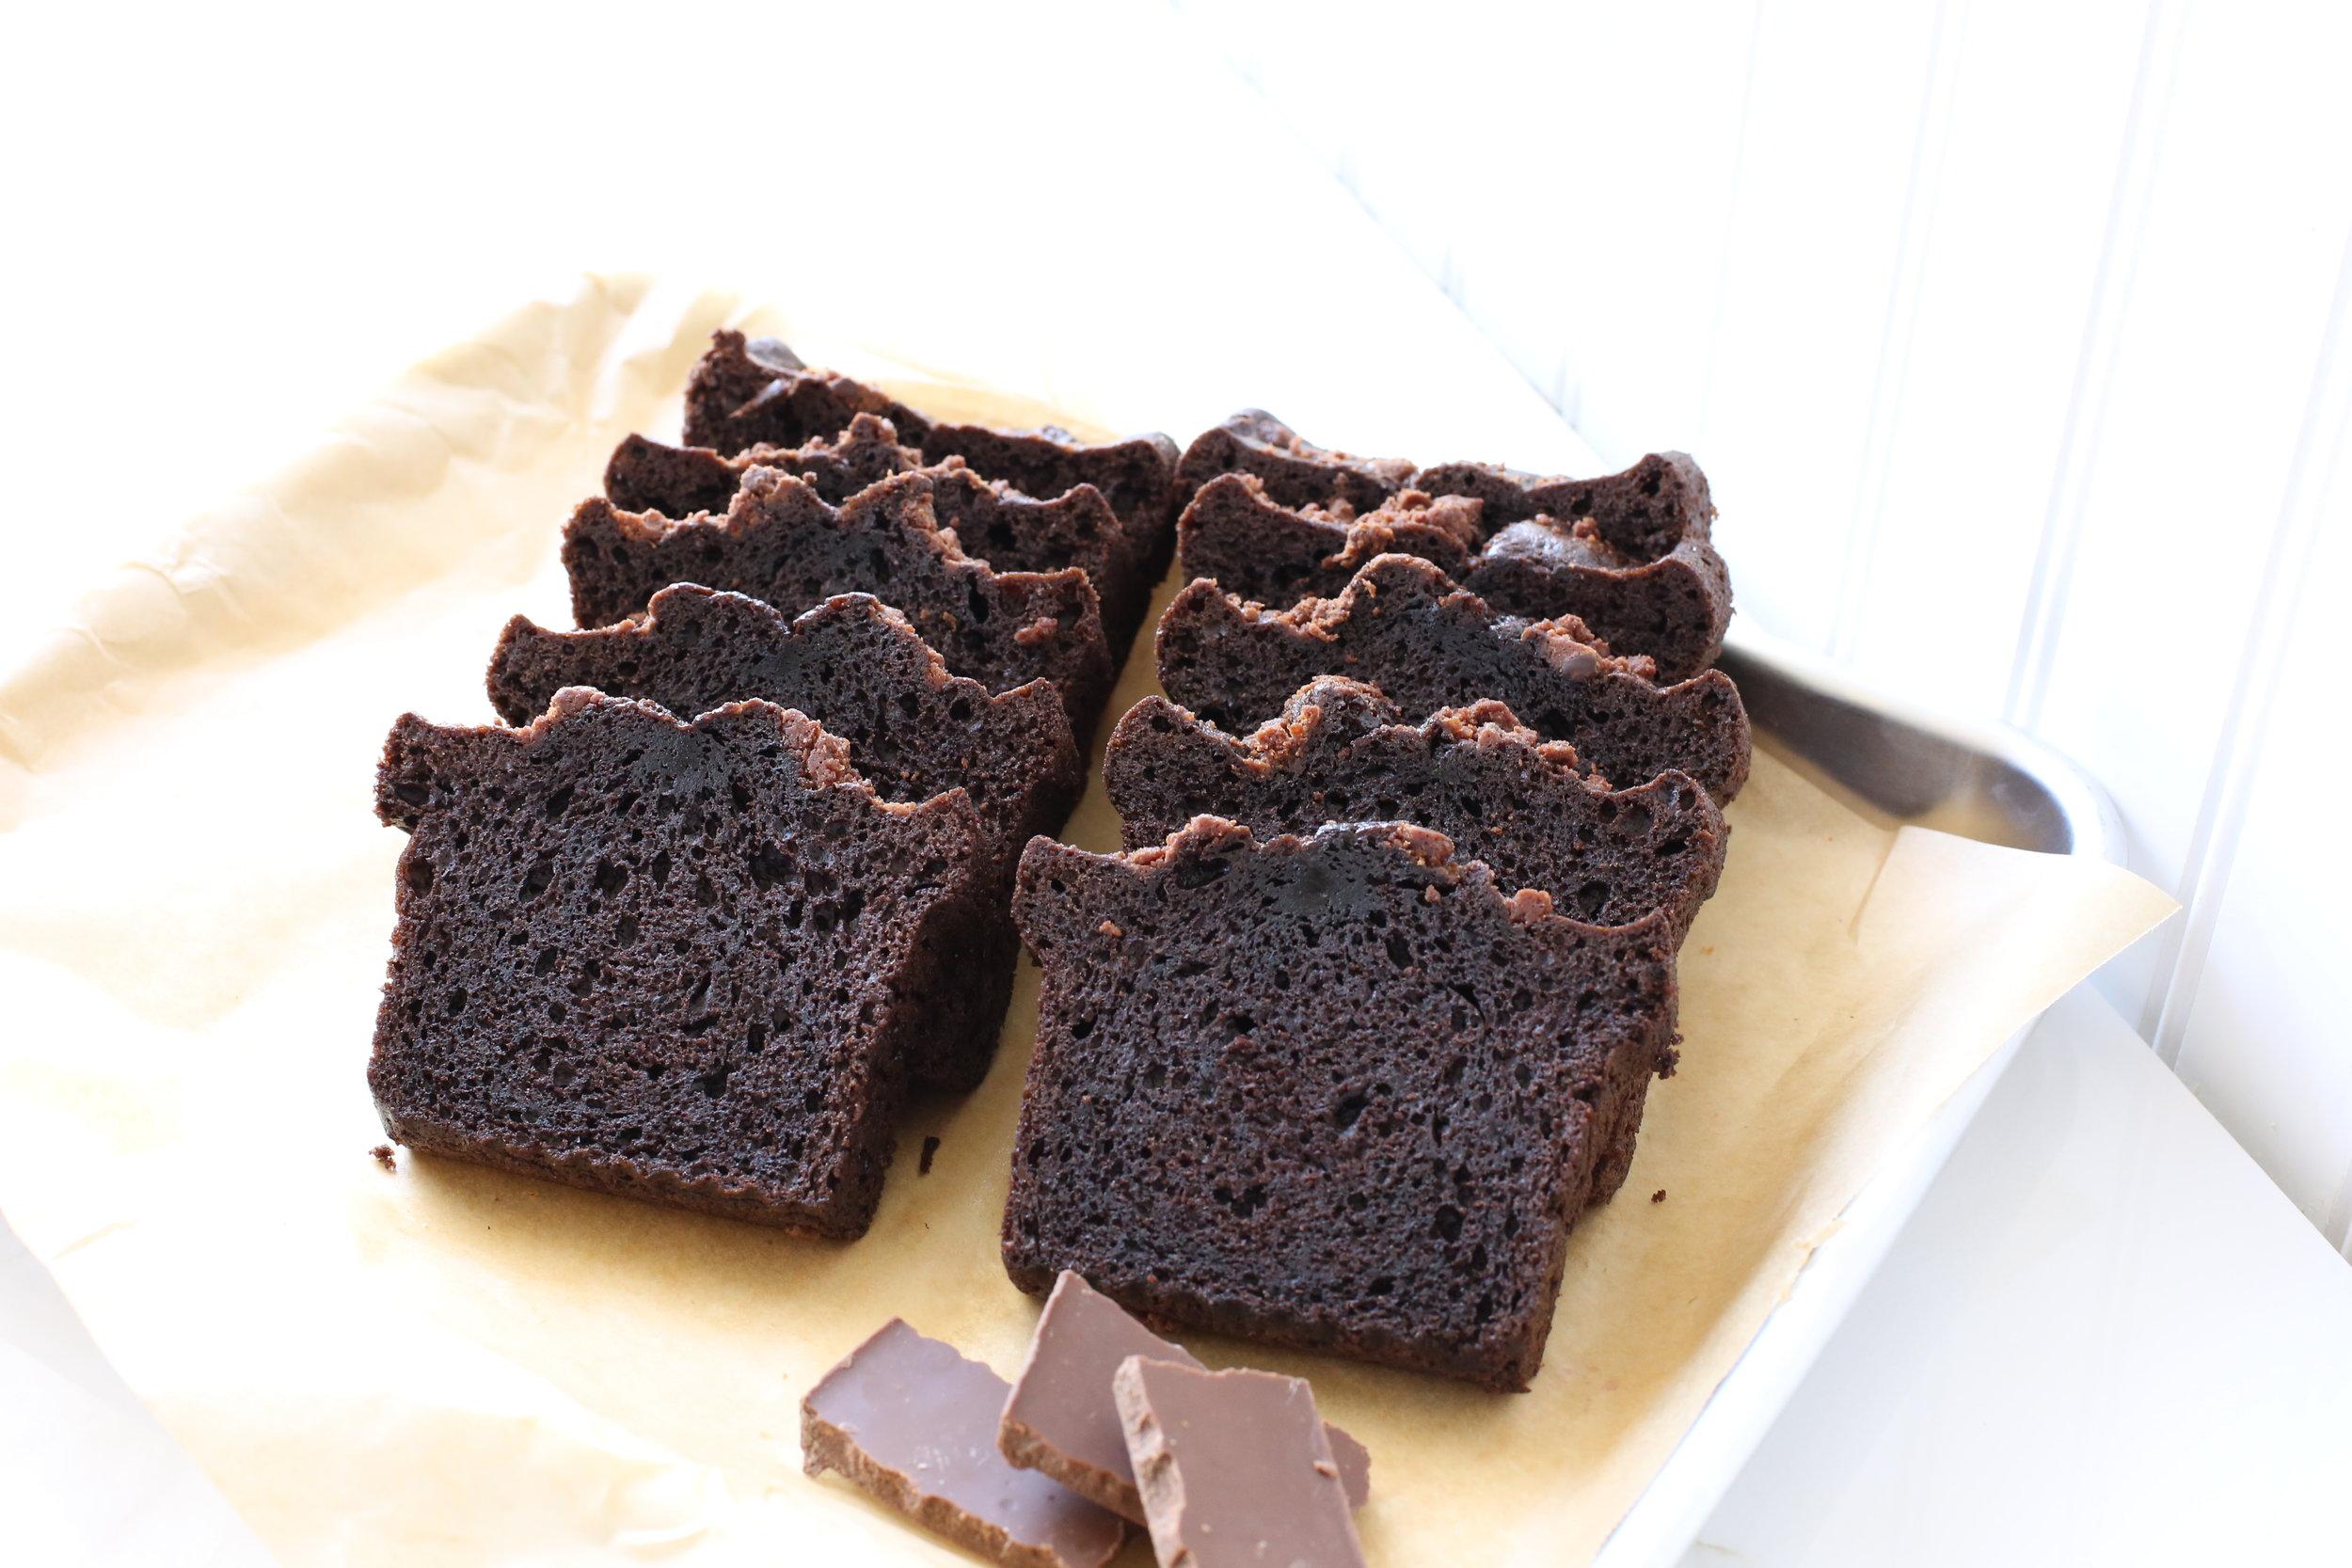 Mrs. Wonderful's Cakes™ - Chocolate Sliced Loaf Cake